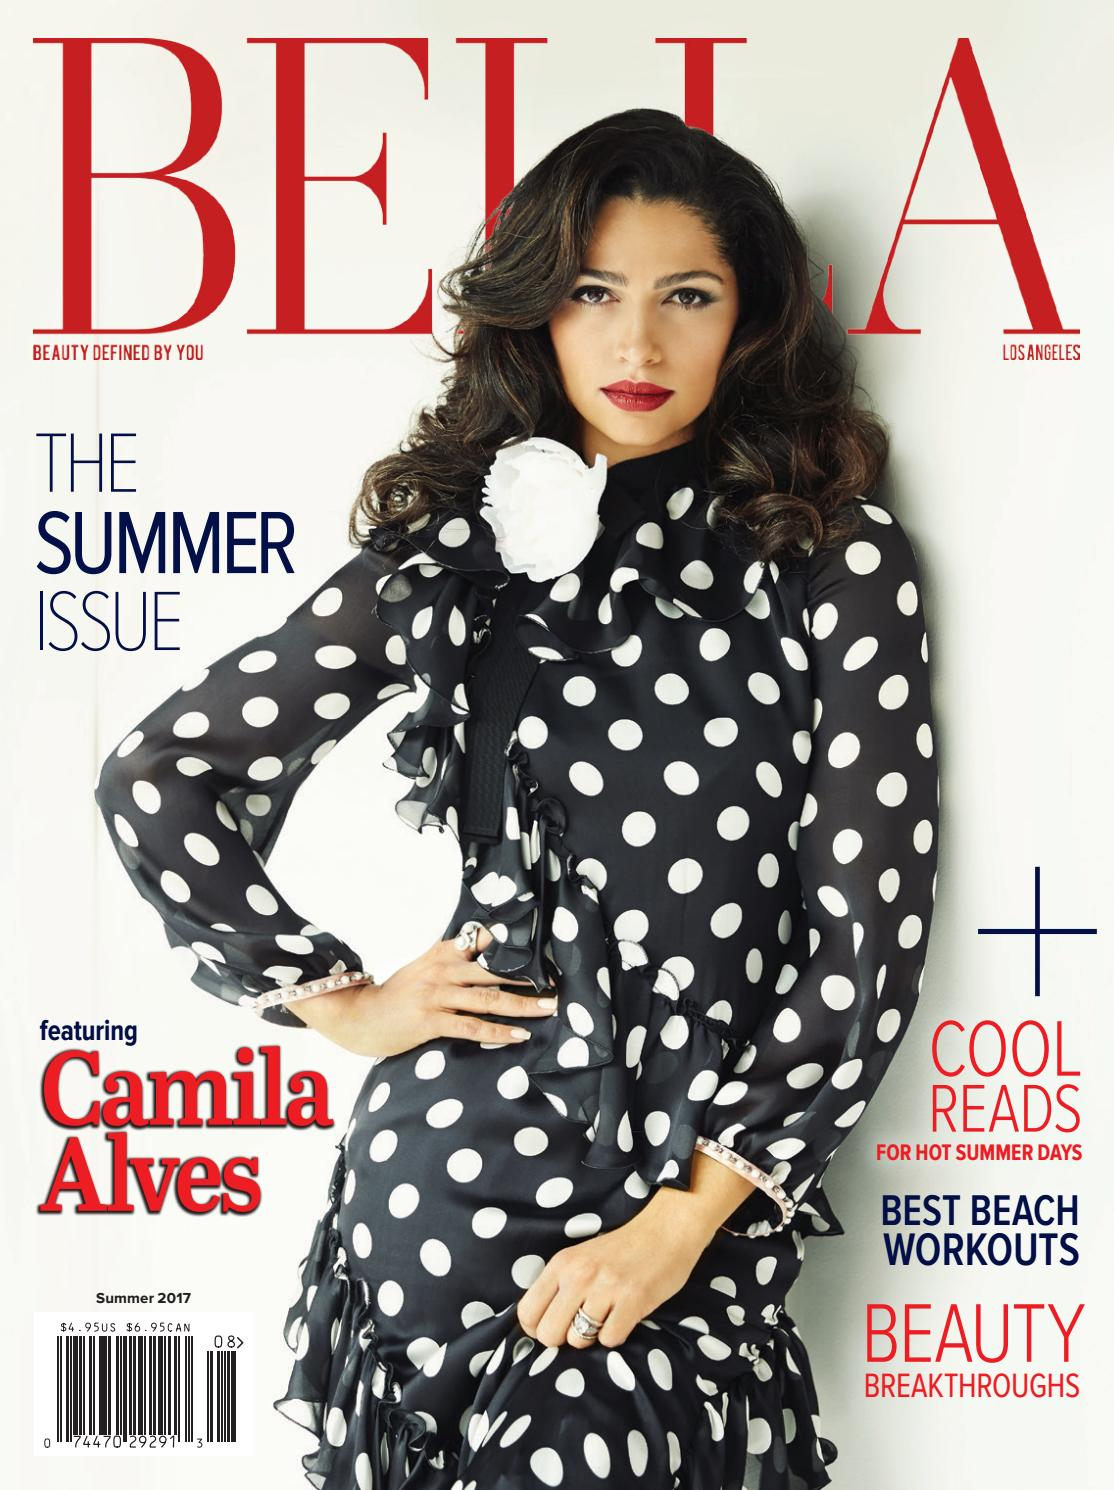 1b179396b08 BELLA Los Angeles-Summer 2017 by BELLA Media Group - issuu